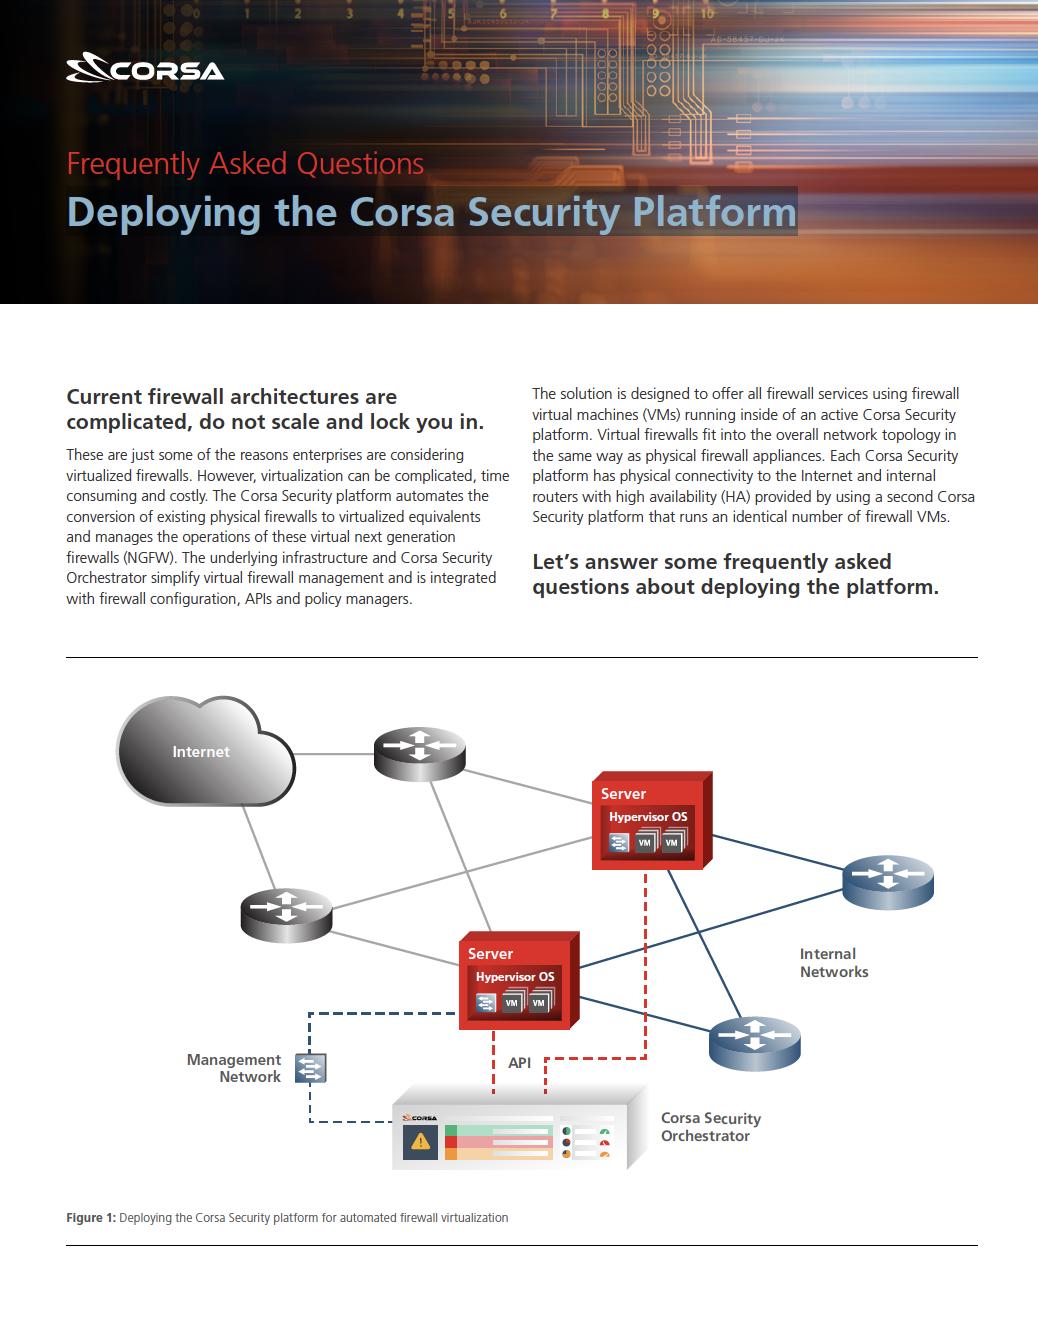 Corsa_FAQ-Deploying_Corsa_Security_Platform-cover-big